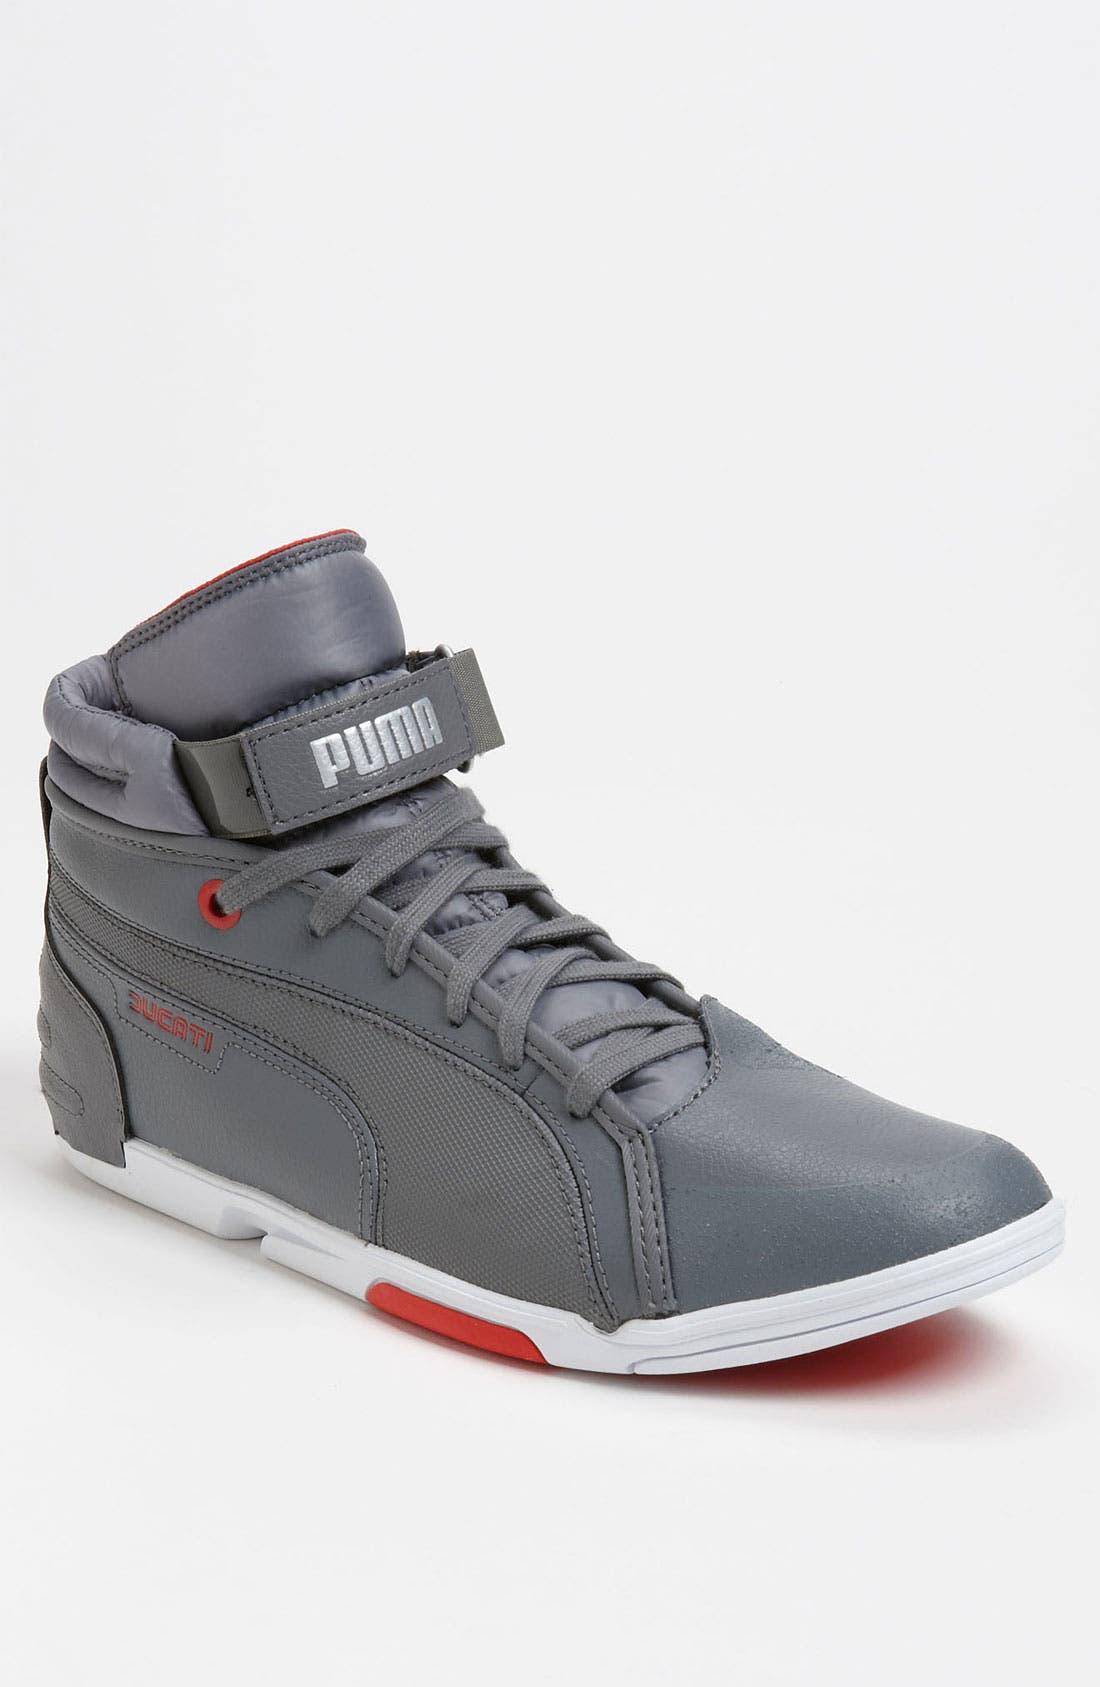 puma xelerate mid 2 shoes